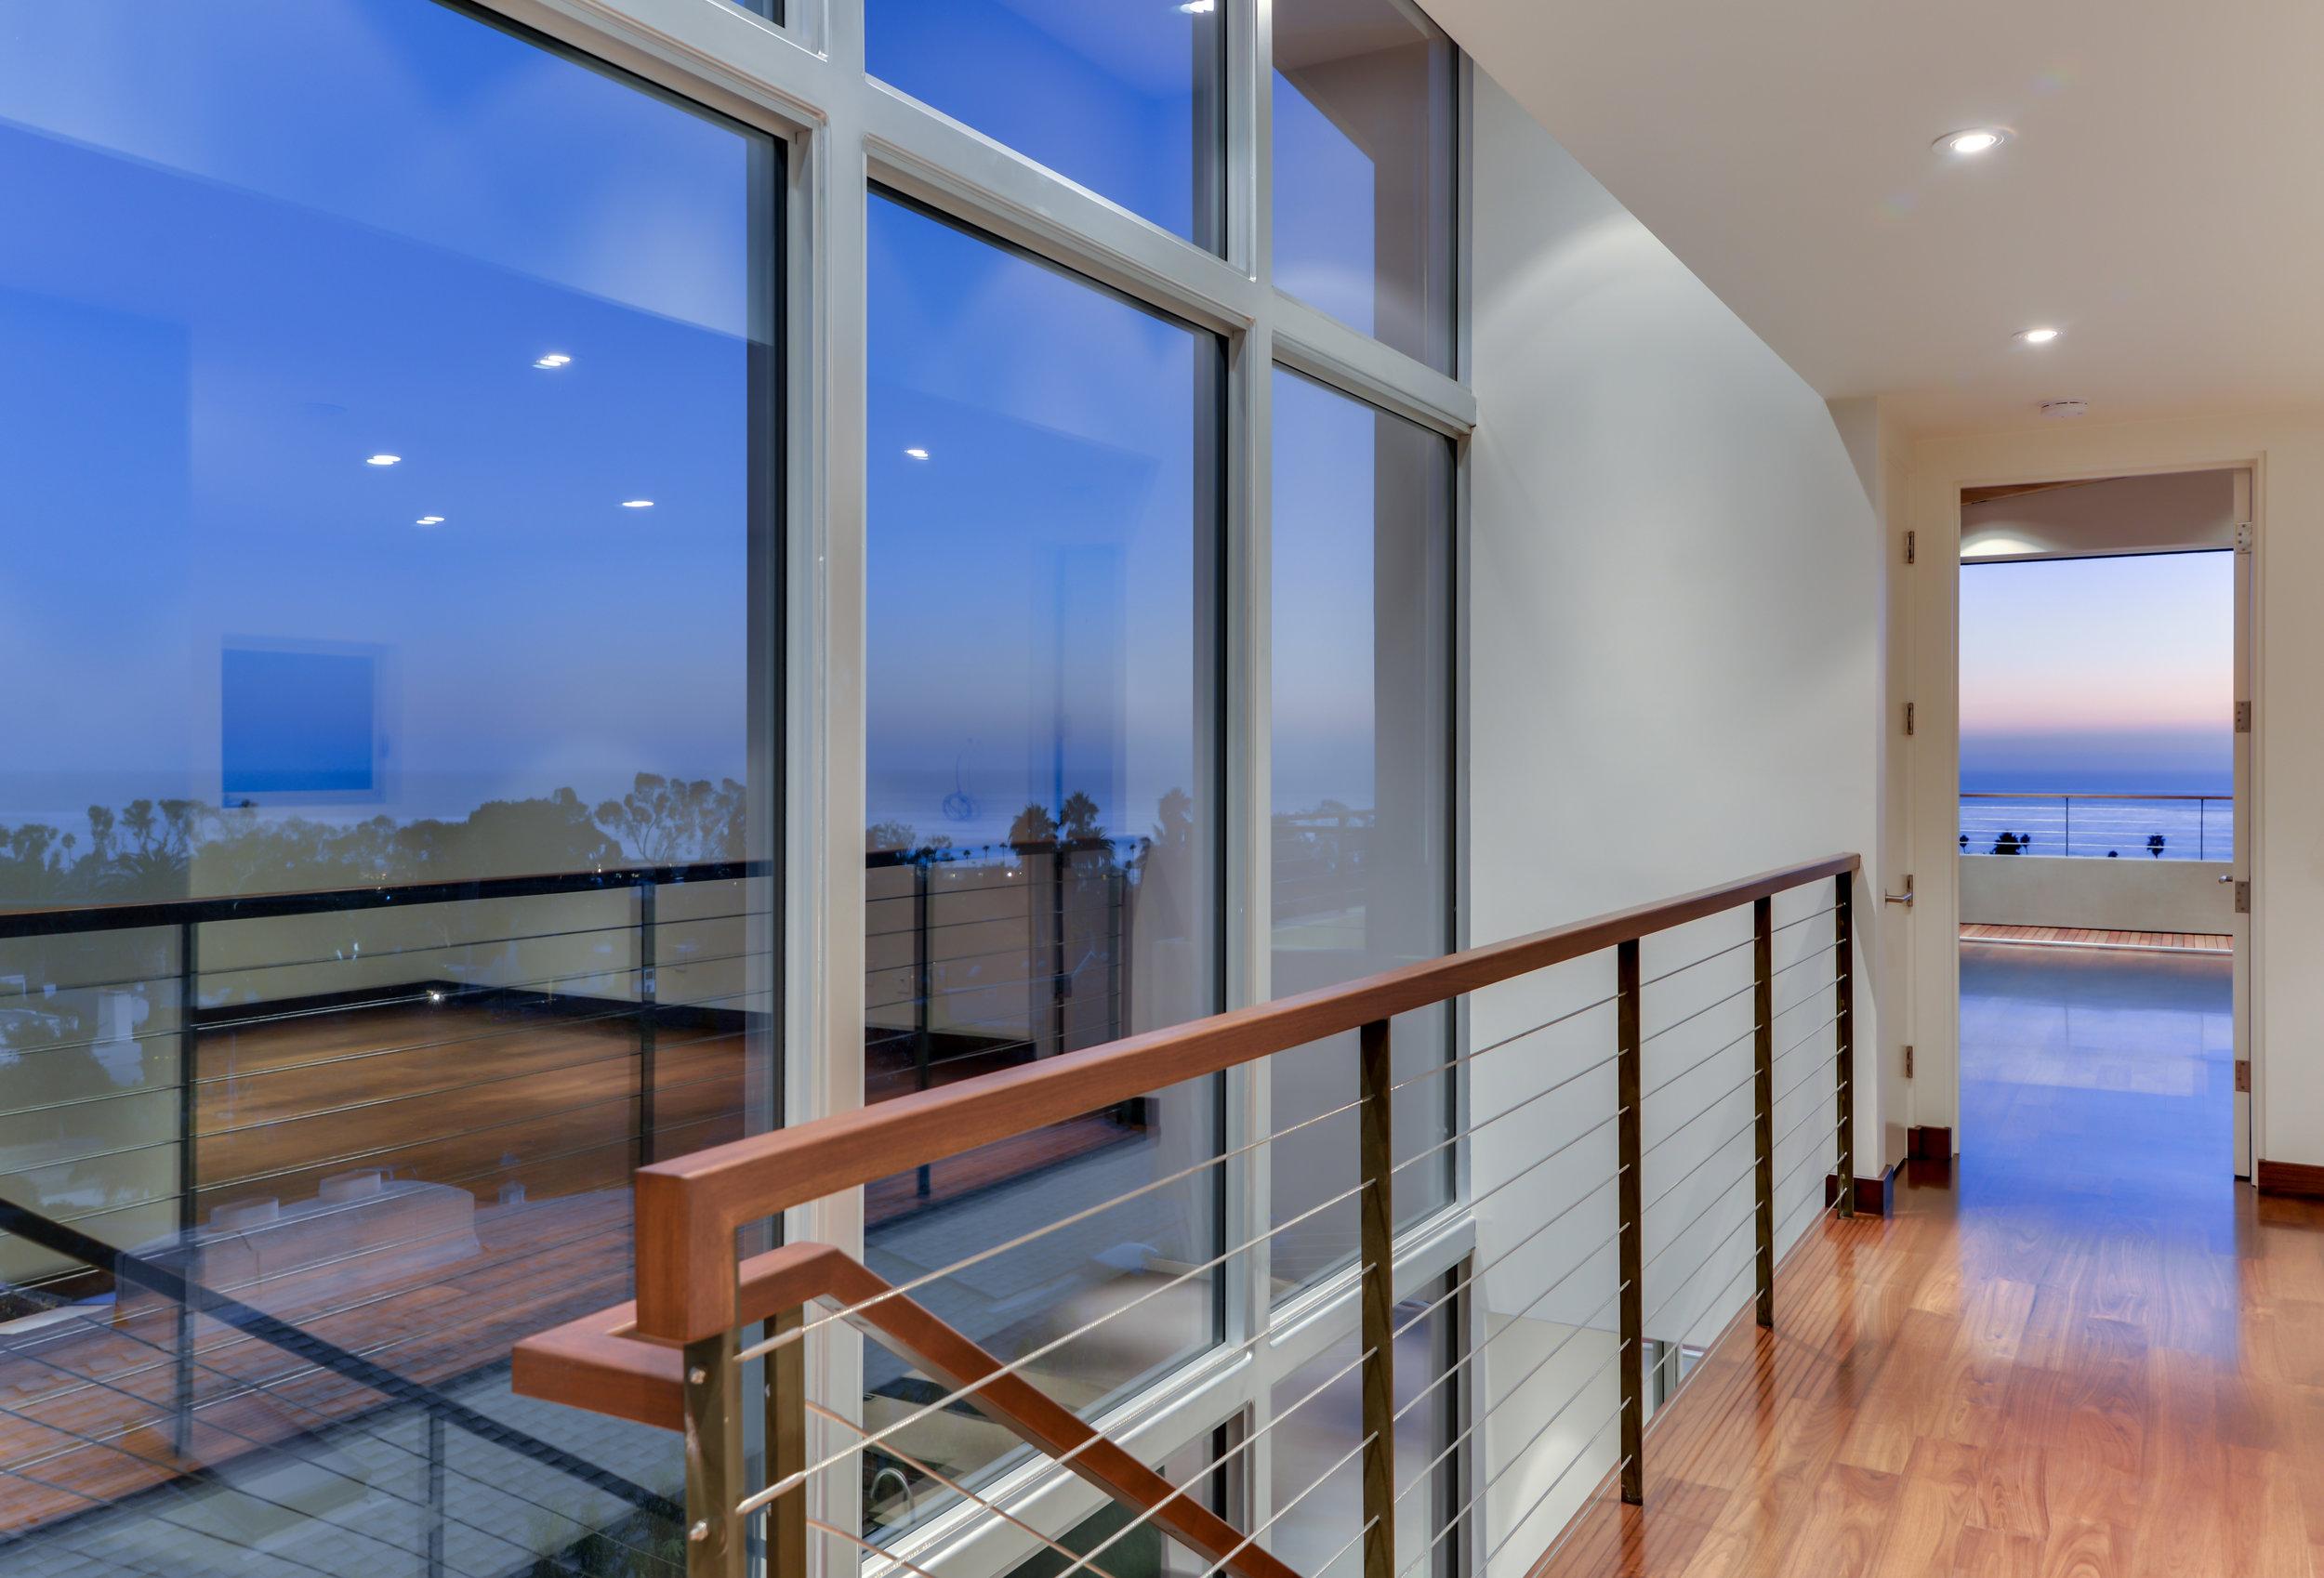 S.E.A.-Studio-Environmental-Architecture-David-Hertz-FAIA-Linda-Rosa-House-La-Jolla-San-Diego-sustainable-regenerative-restorative-design-modern-residential-mindful-garden-panoramic-ocean-view-open-concept-california-dream-18.jpg